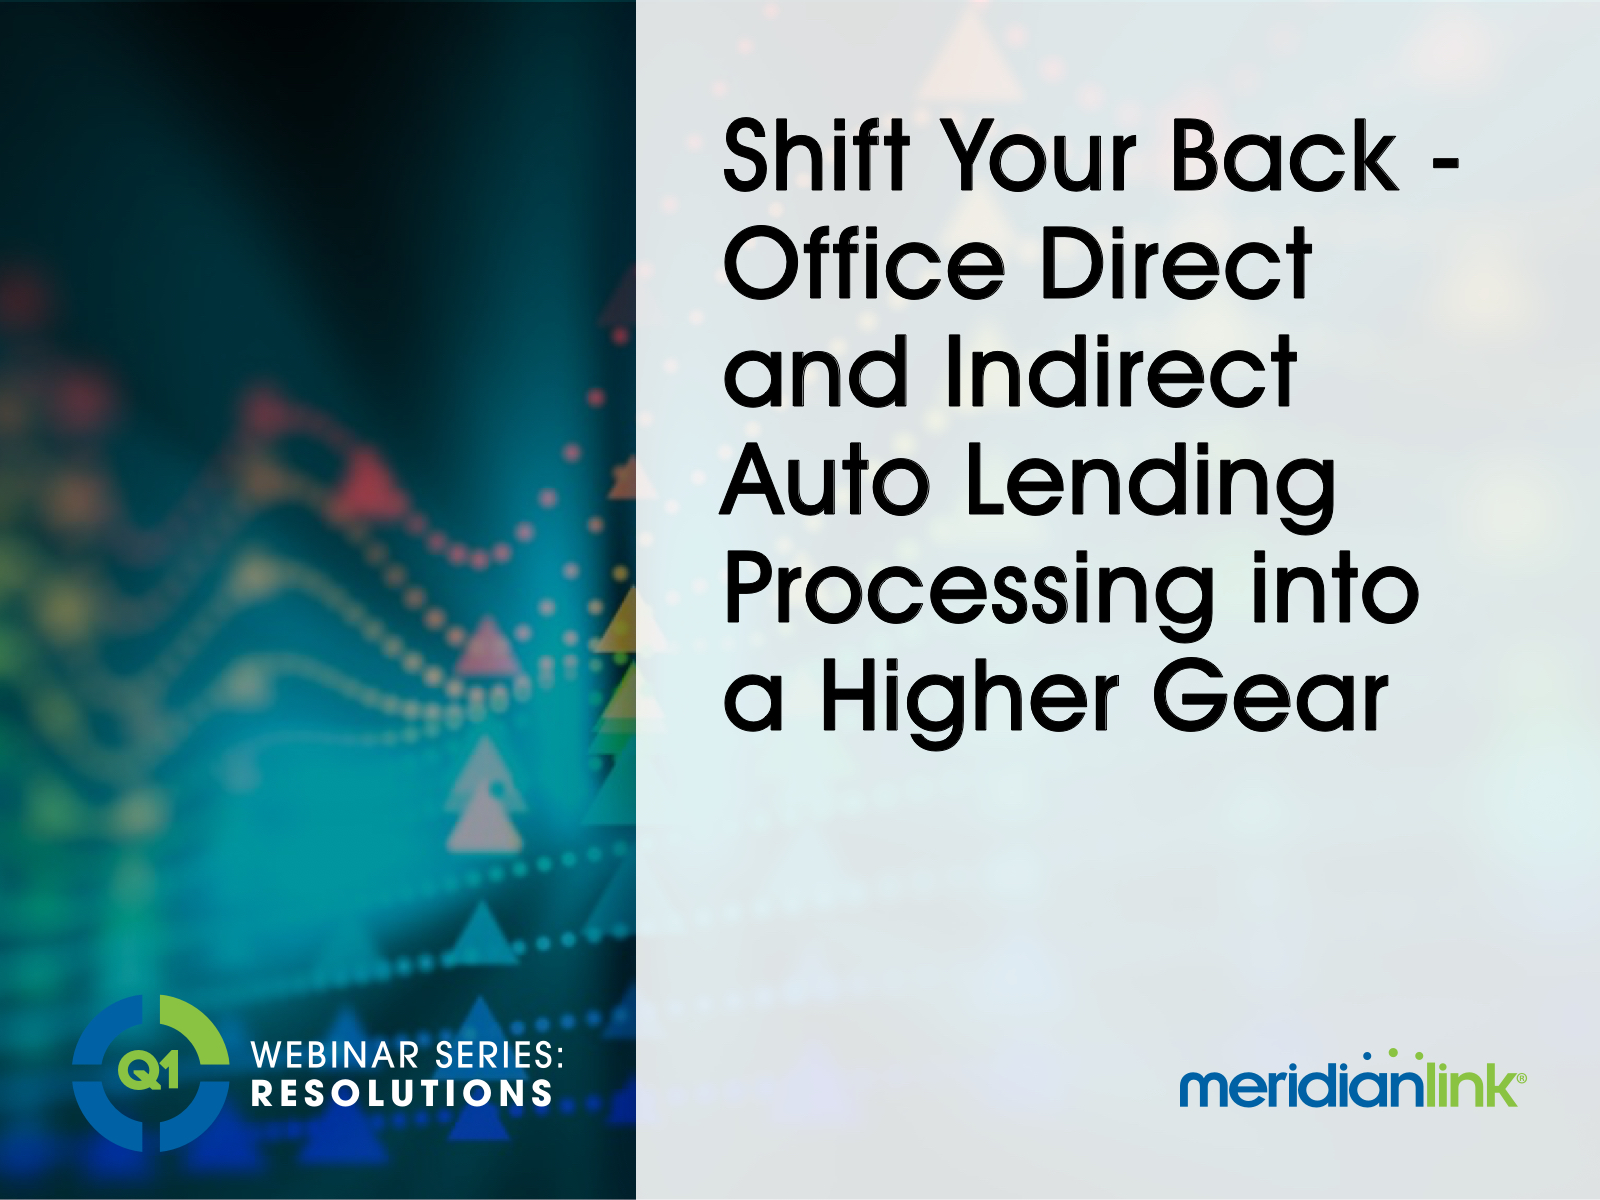 Q1-webinar-direct-indirect-lending-3